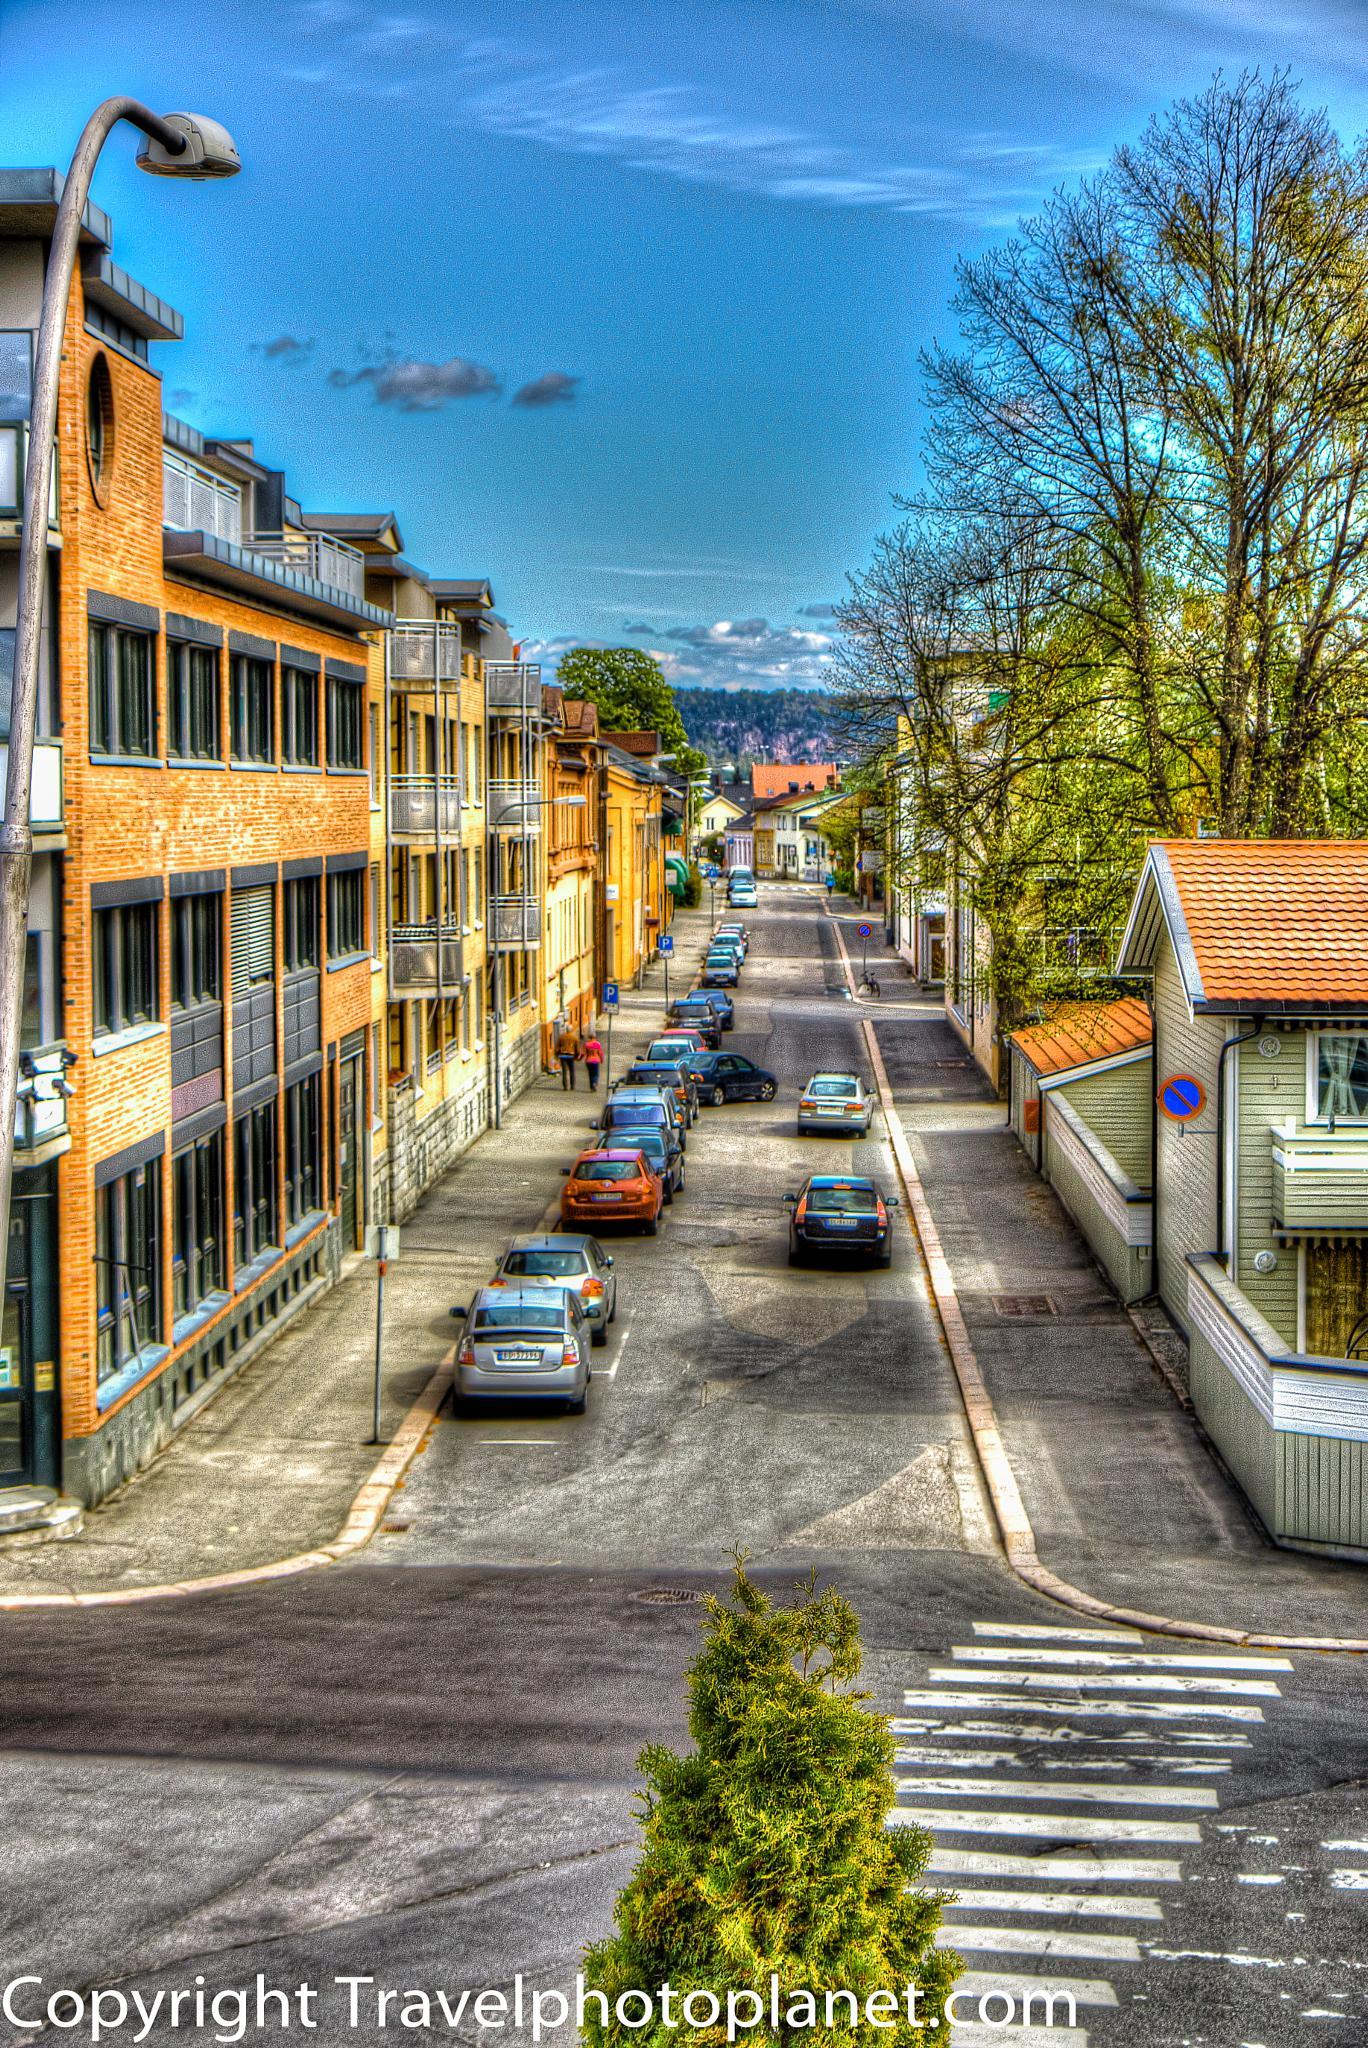 HDR Street by Svein Arne Grønnevik